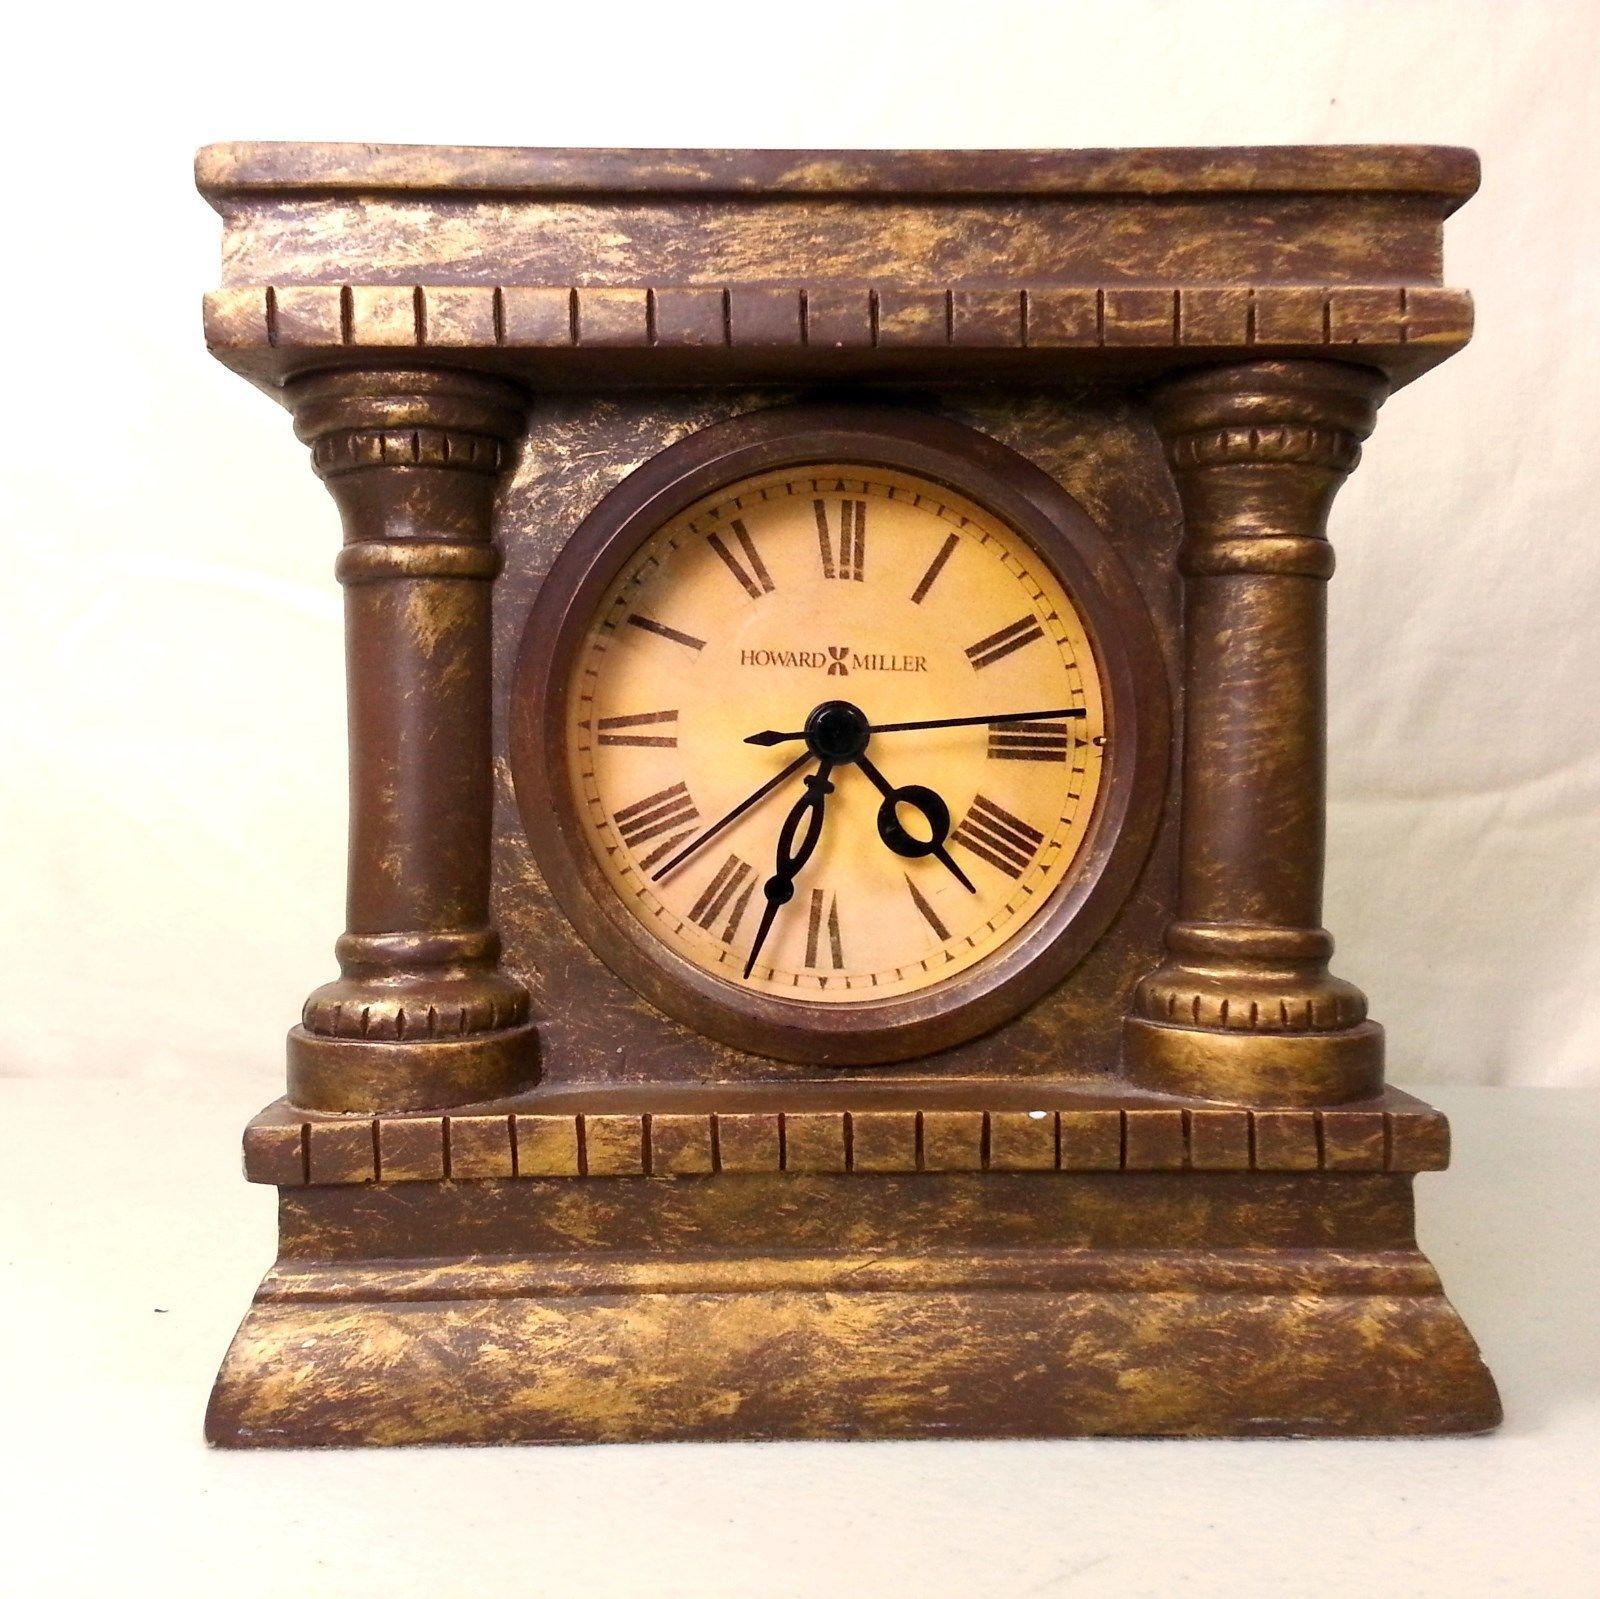 Howard Miller Mantel Clock Bronze Look   Classic Greco Roman Motif With  Columns   $29.99